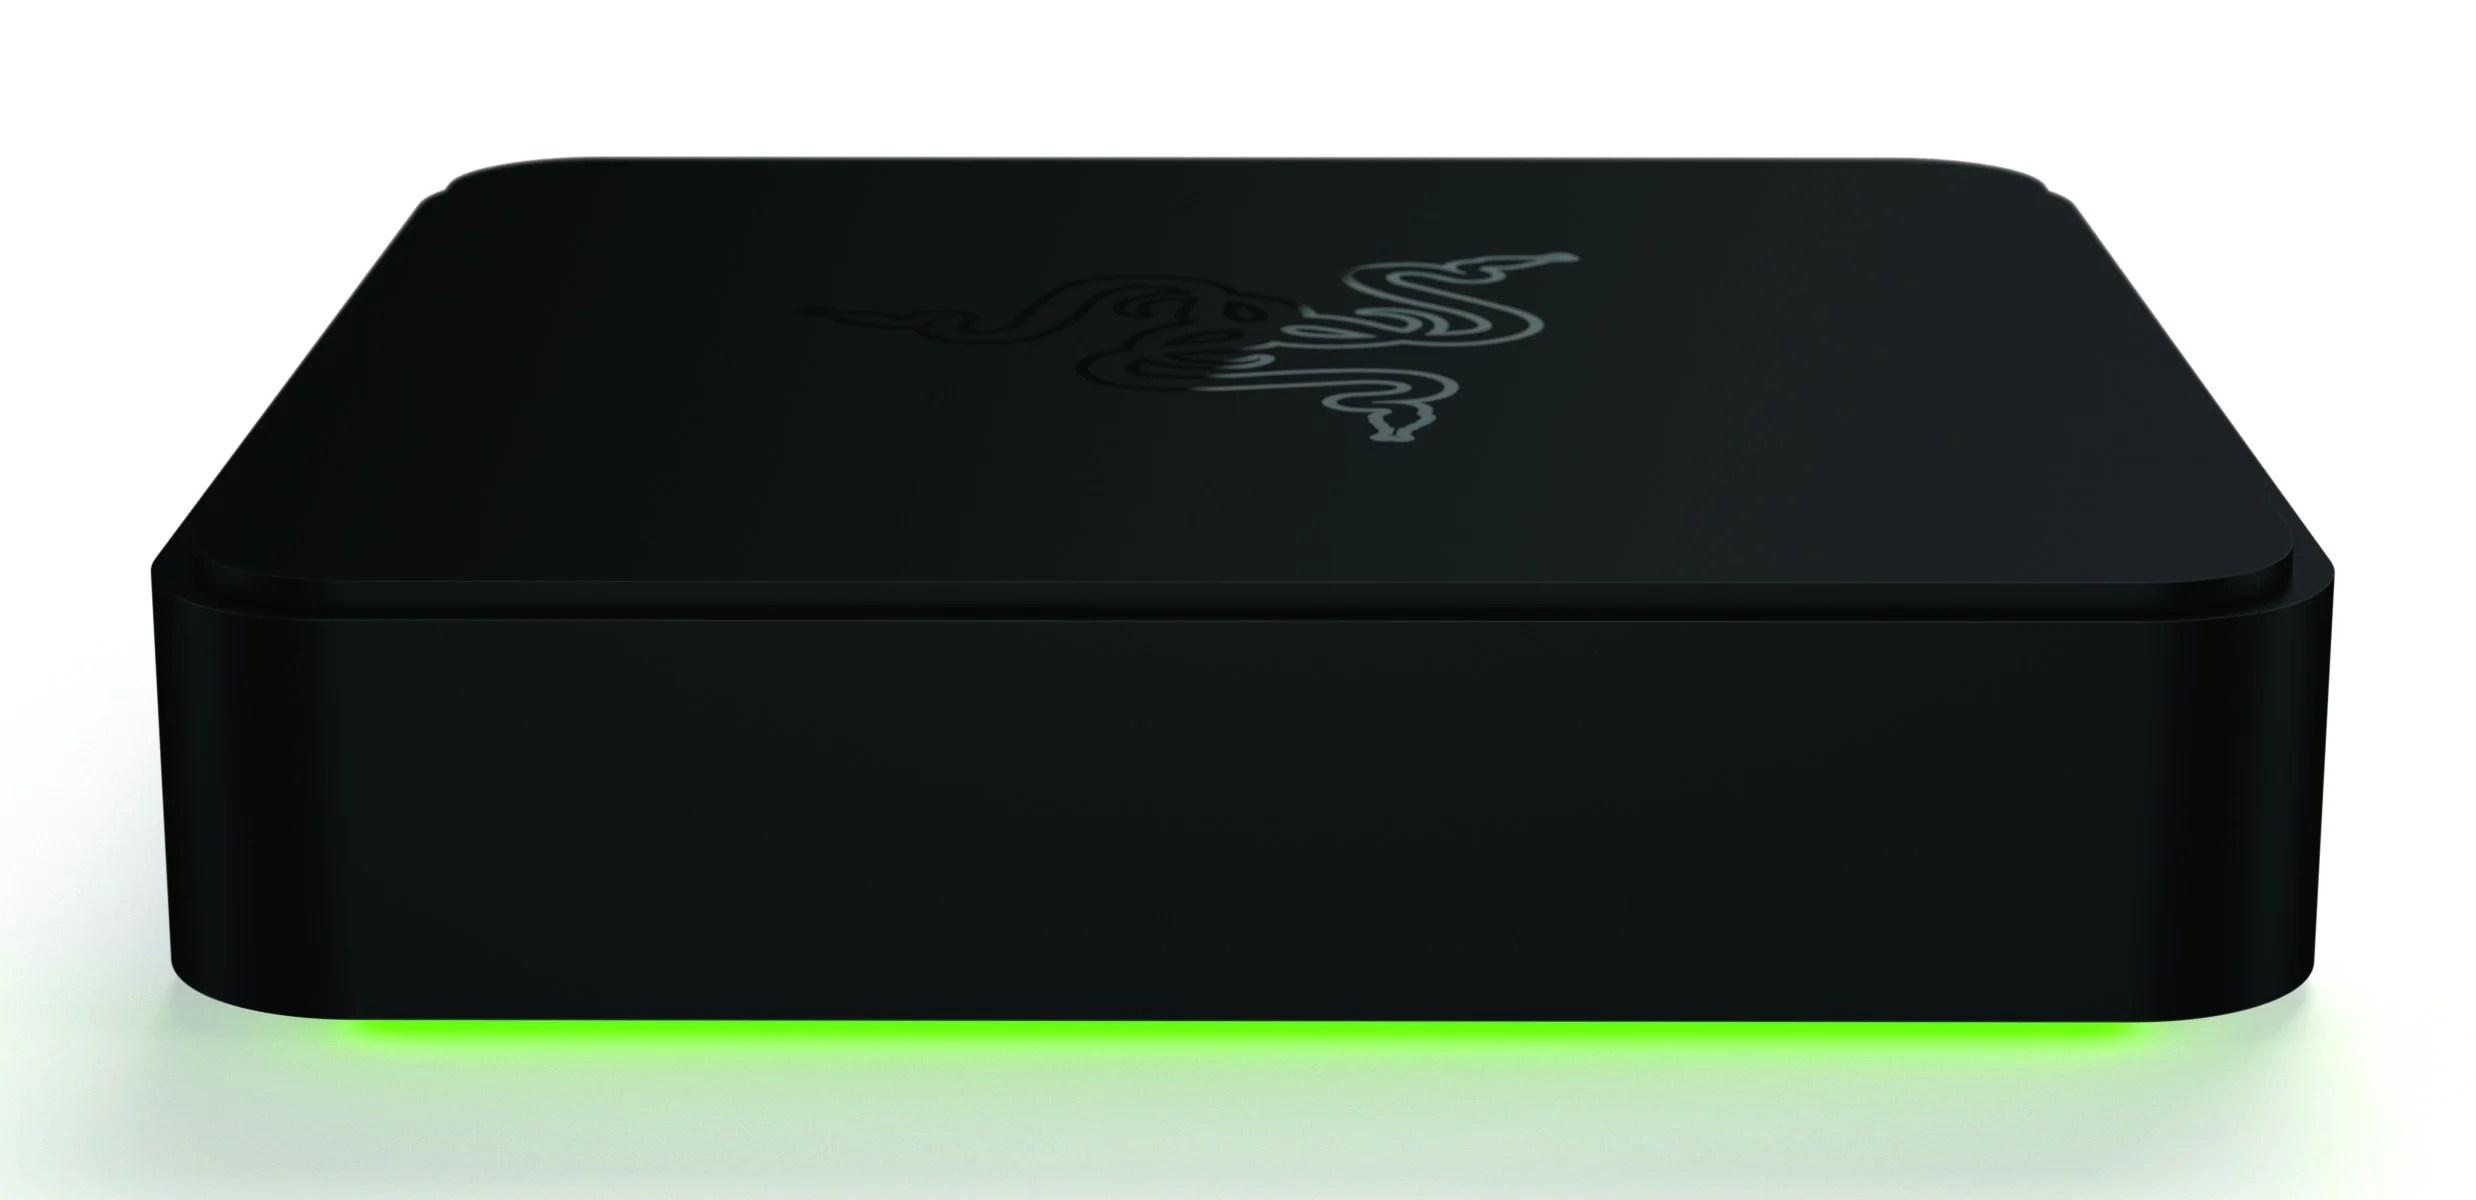 Razer dévoile sa micro-console sous Android TV